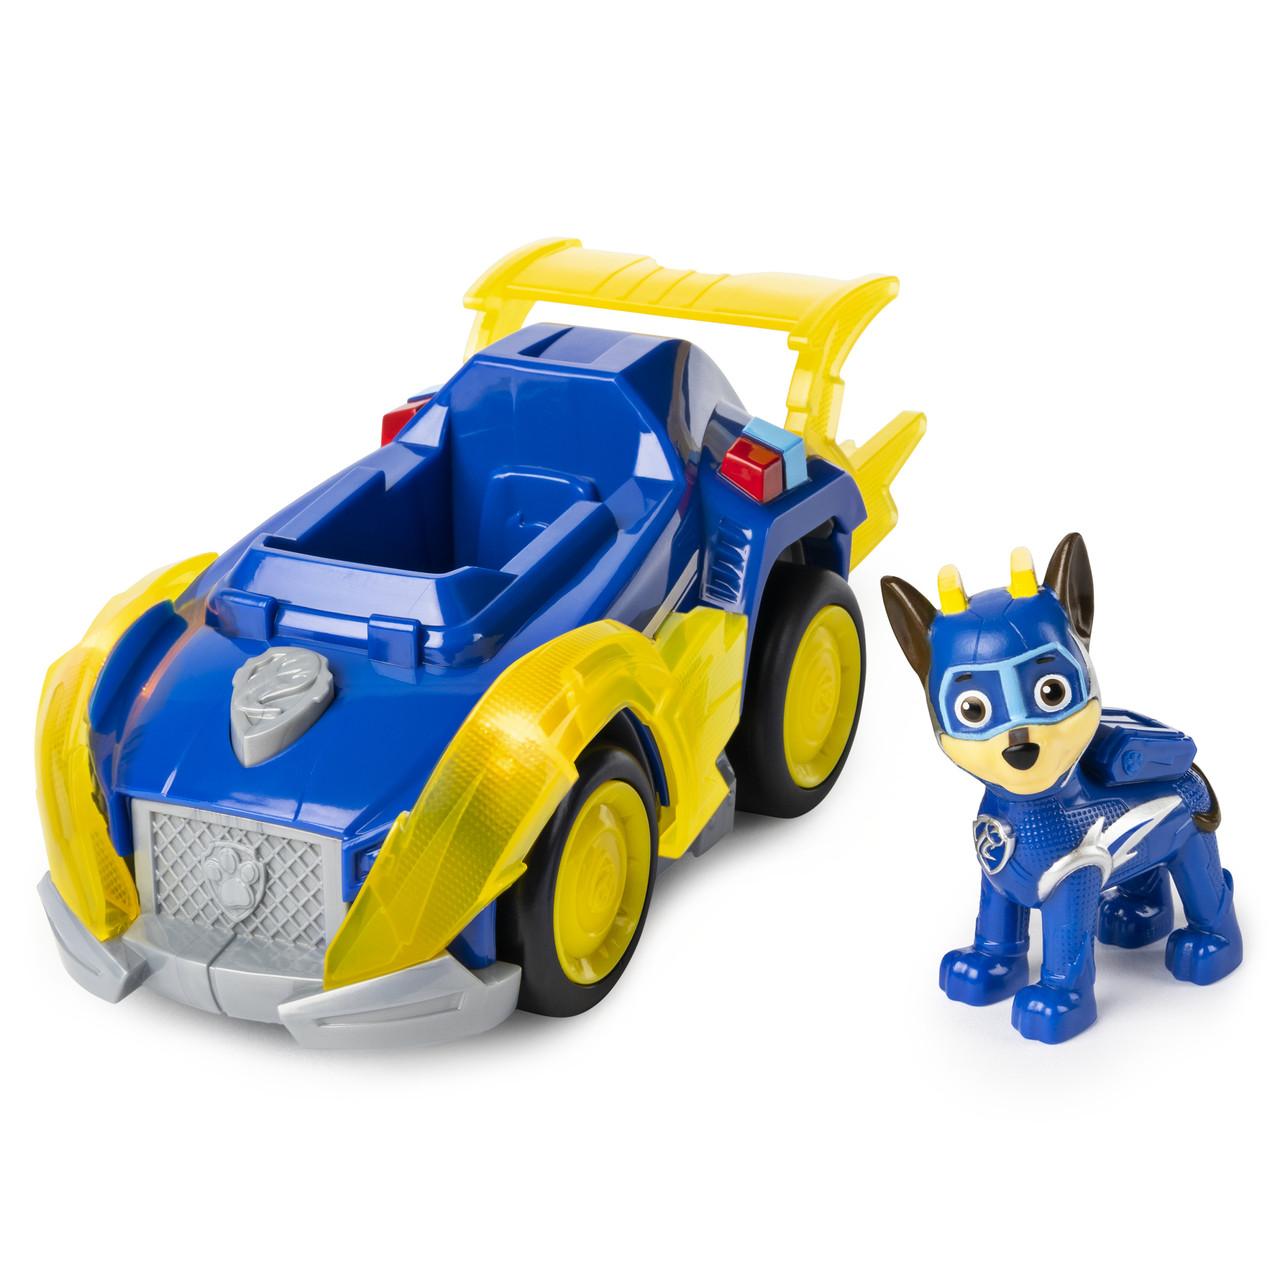 Paw Patrol Щенячий патруль Могучие Щенки Гонщик Чейз Mighty Pups Super Paws Chase's Deluxe Vehicle